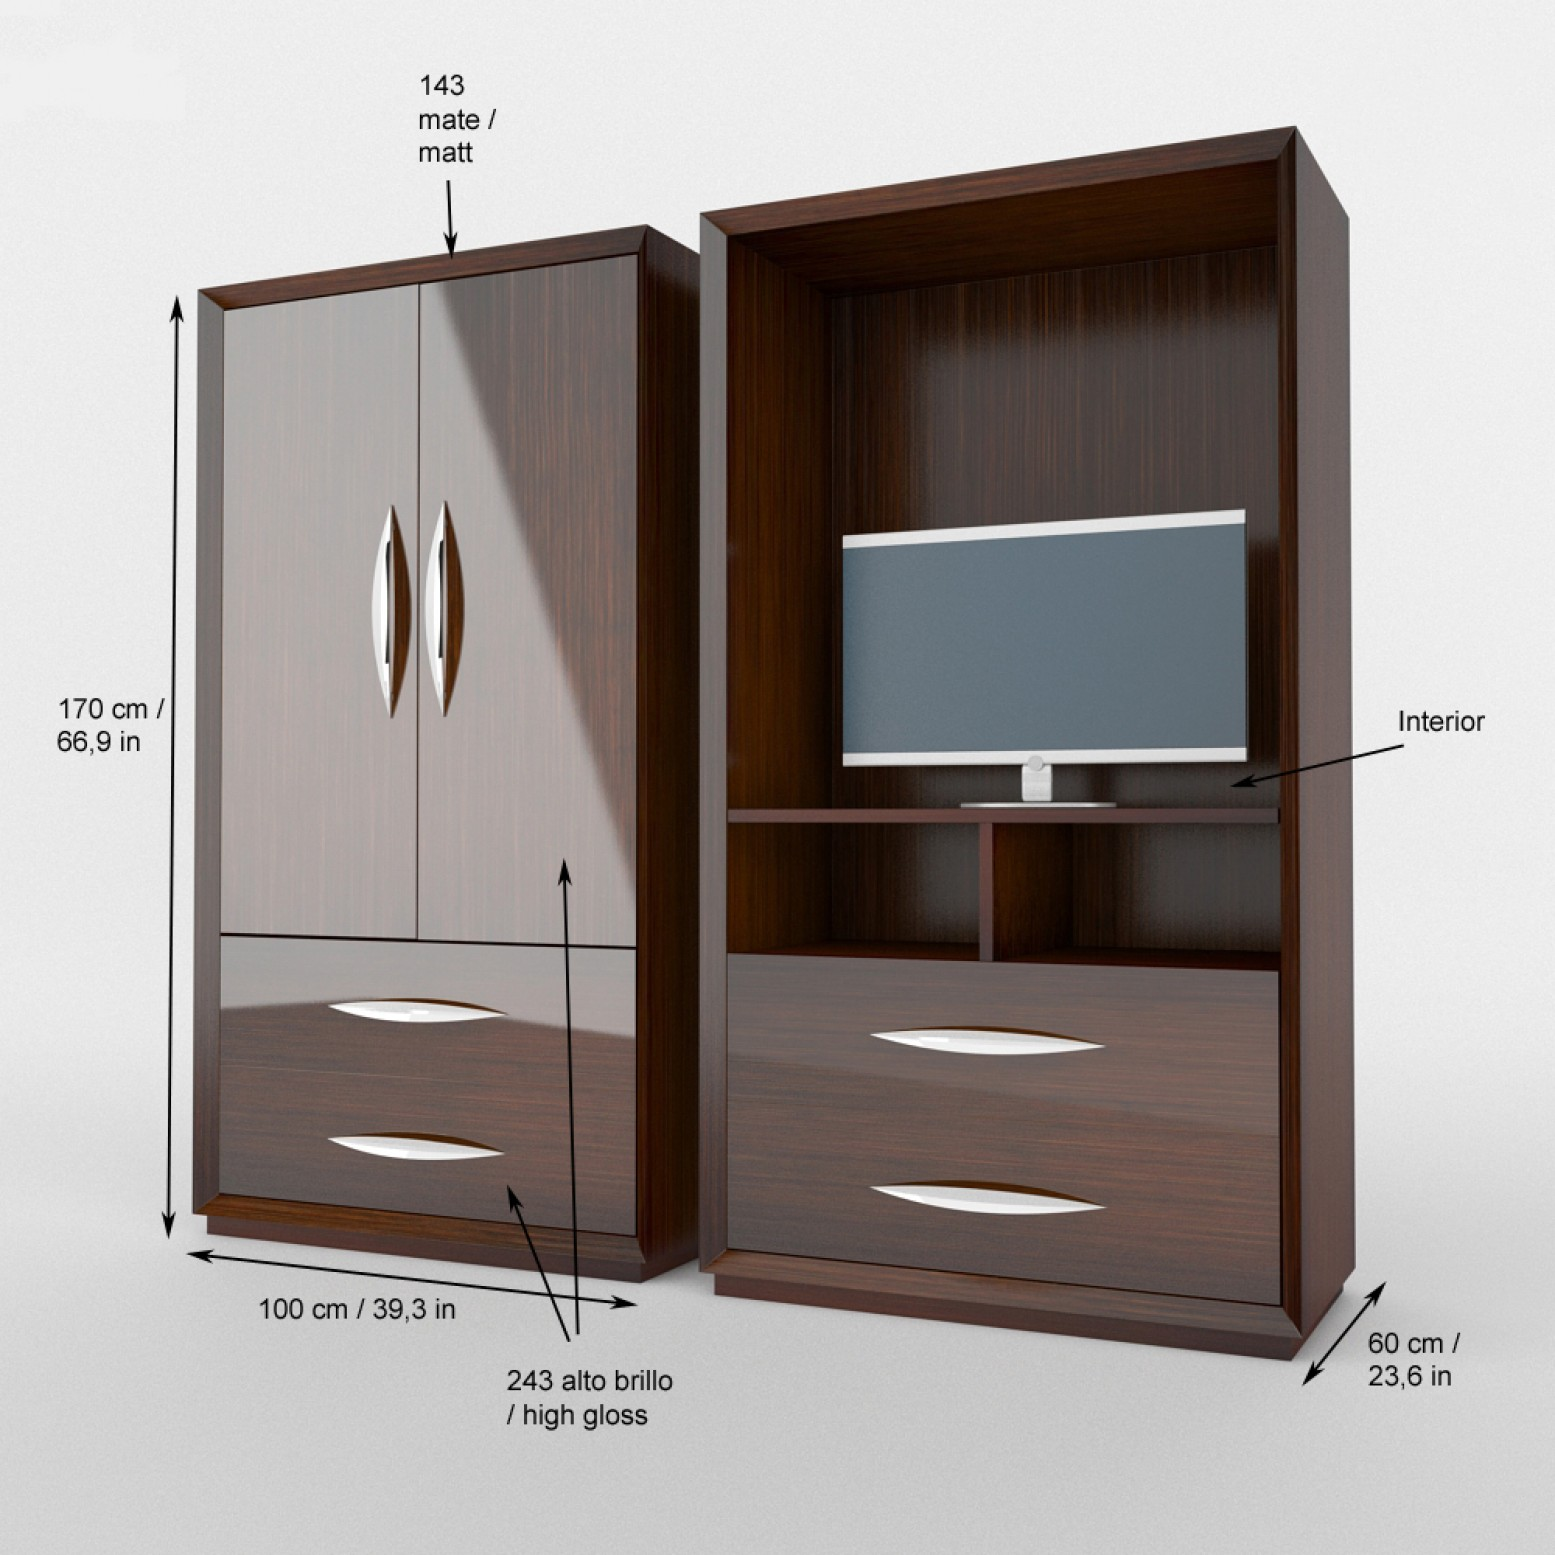 Carmen Walnut Modern Italian Bedroom Set: Carmen Queen Size Bedroom Set, Composition 1, Walnut Buy